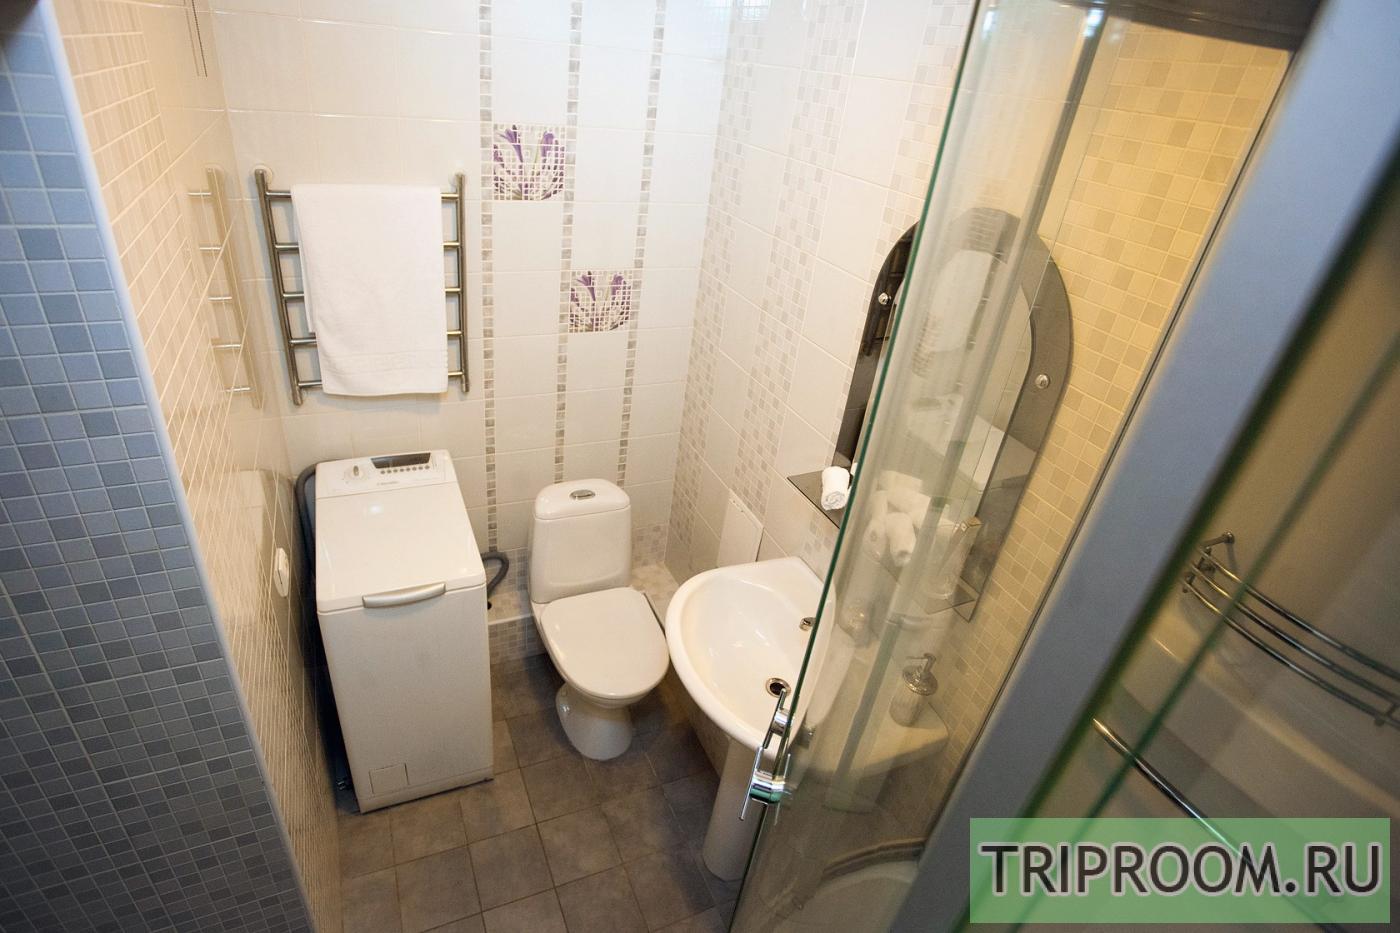 1-комнатная квартира посуточно (вариант № 30226), ул. Кирова проспект, фото № 12